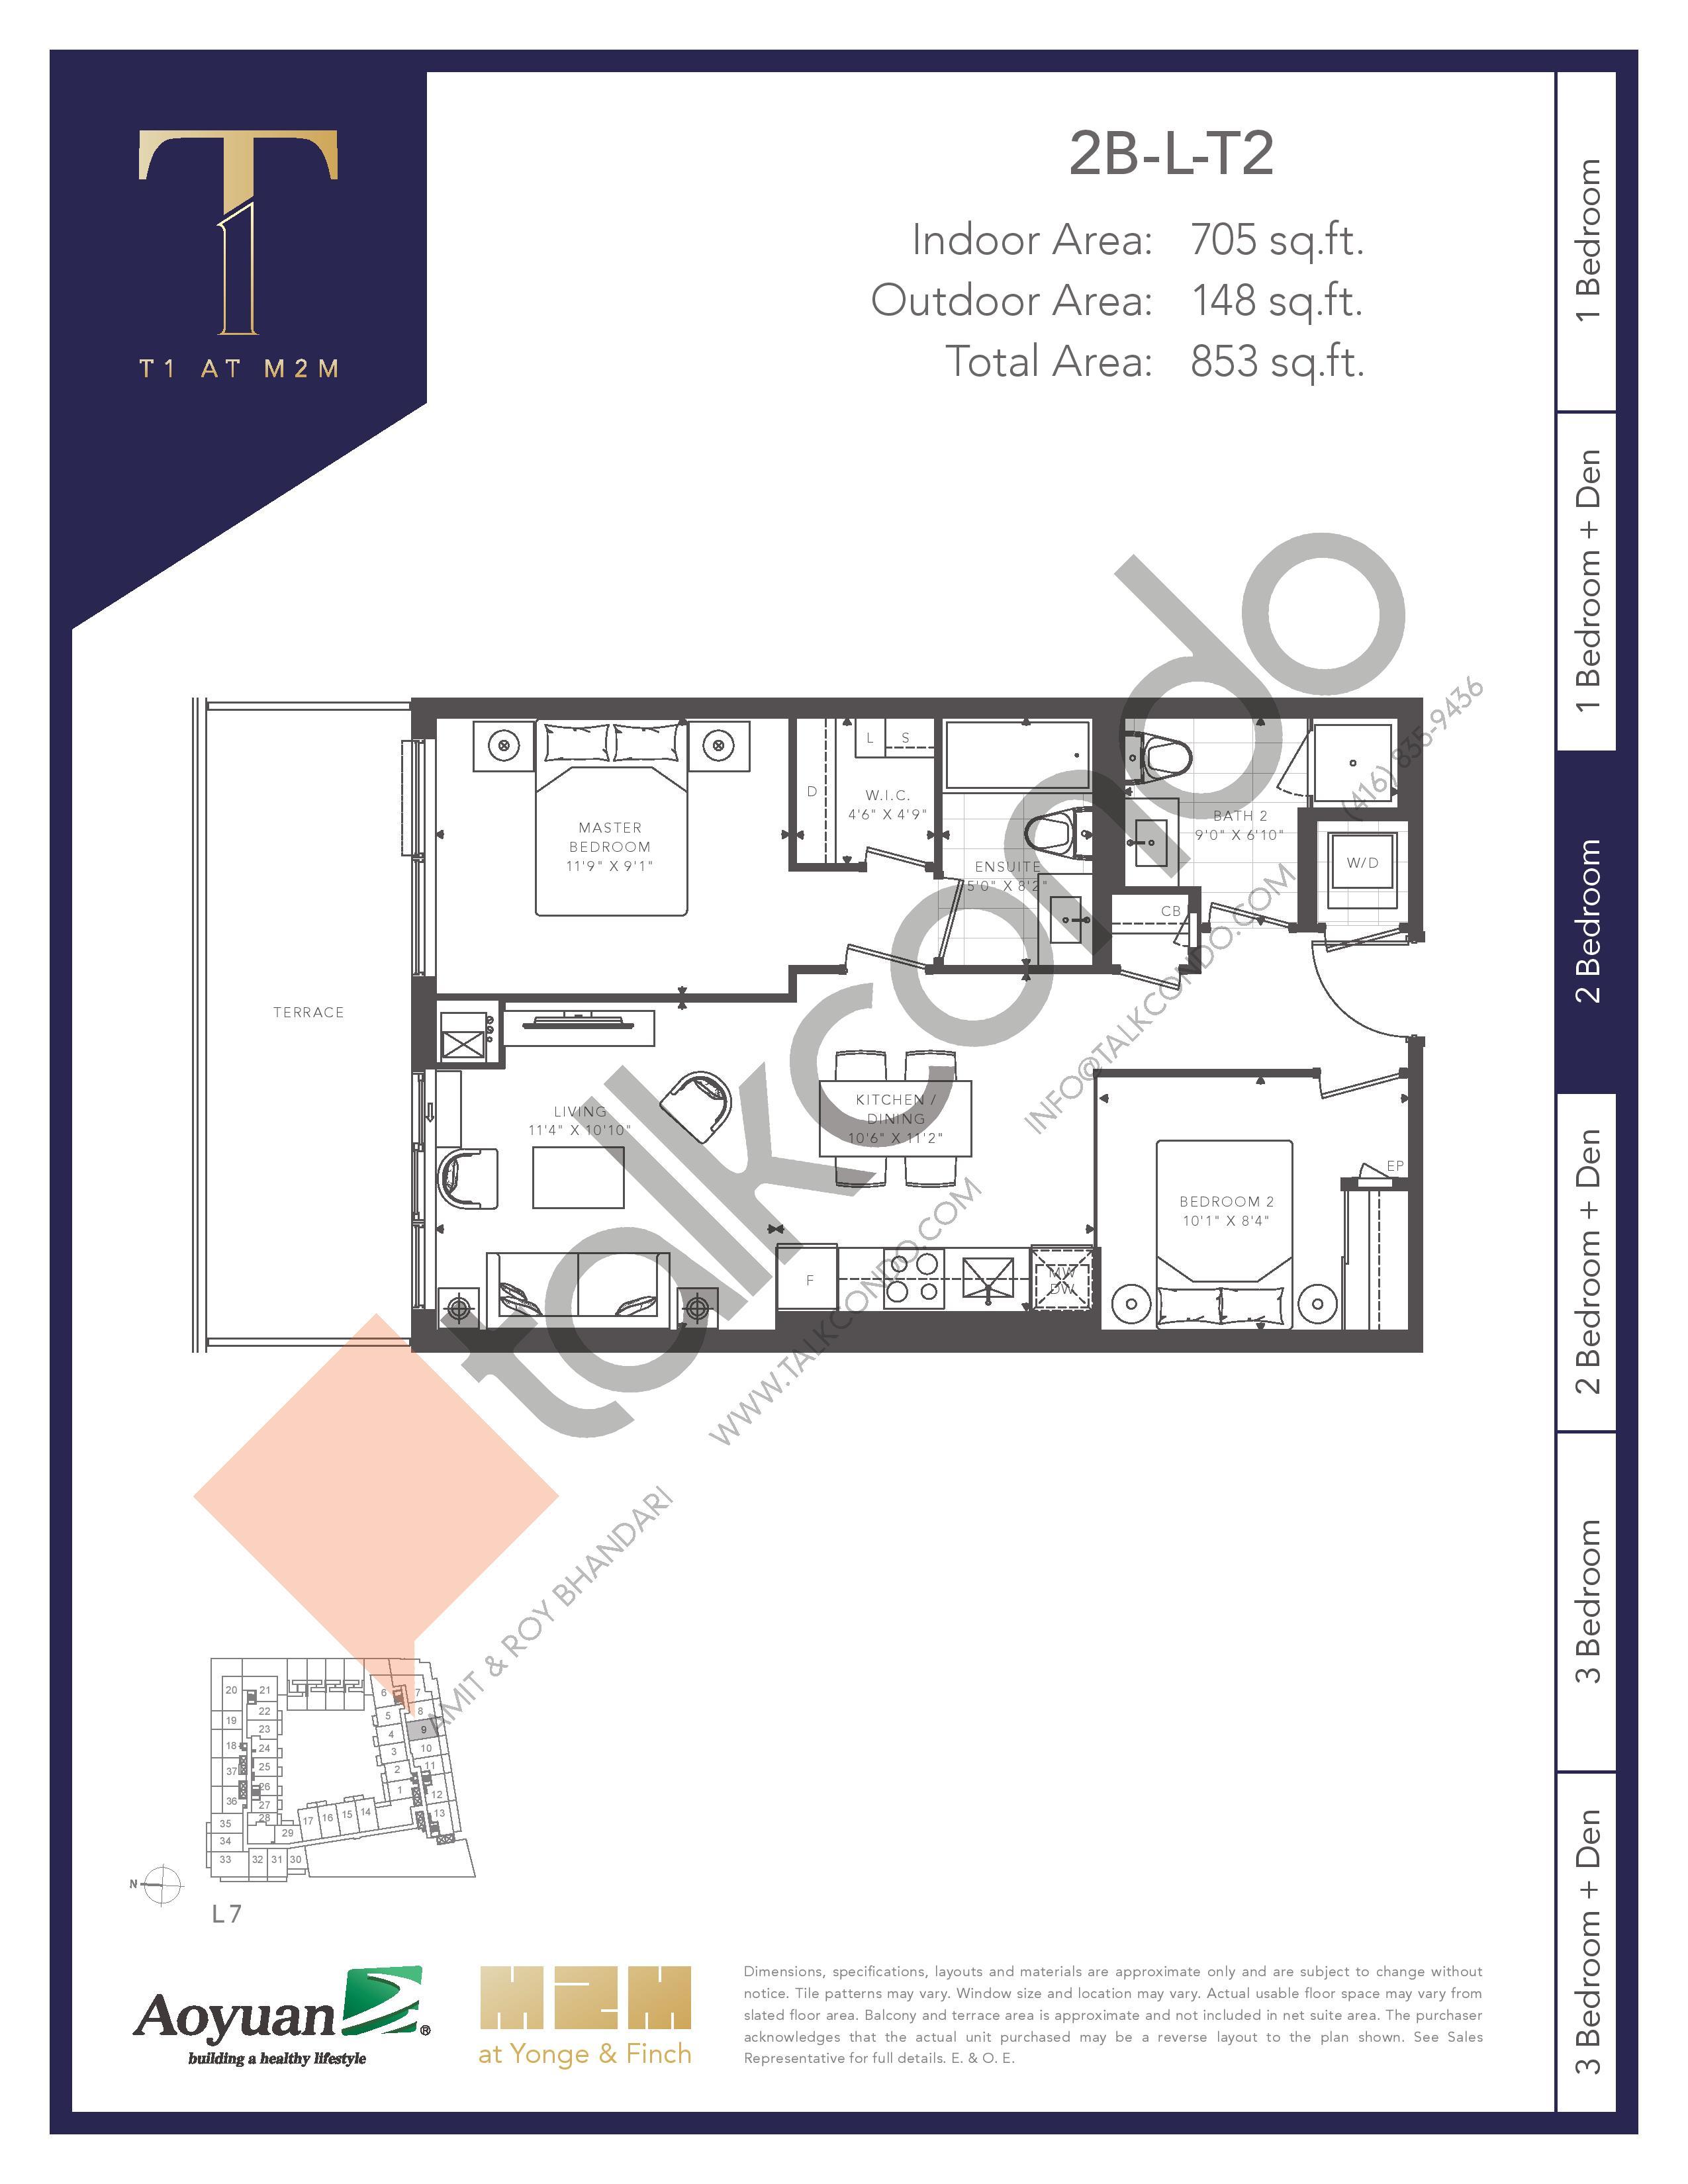 2B-L-T2 (Tower) Floor Plan at T1 at M2M Condos - 705 sq.ft